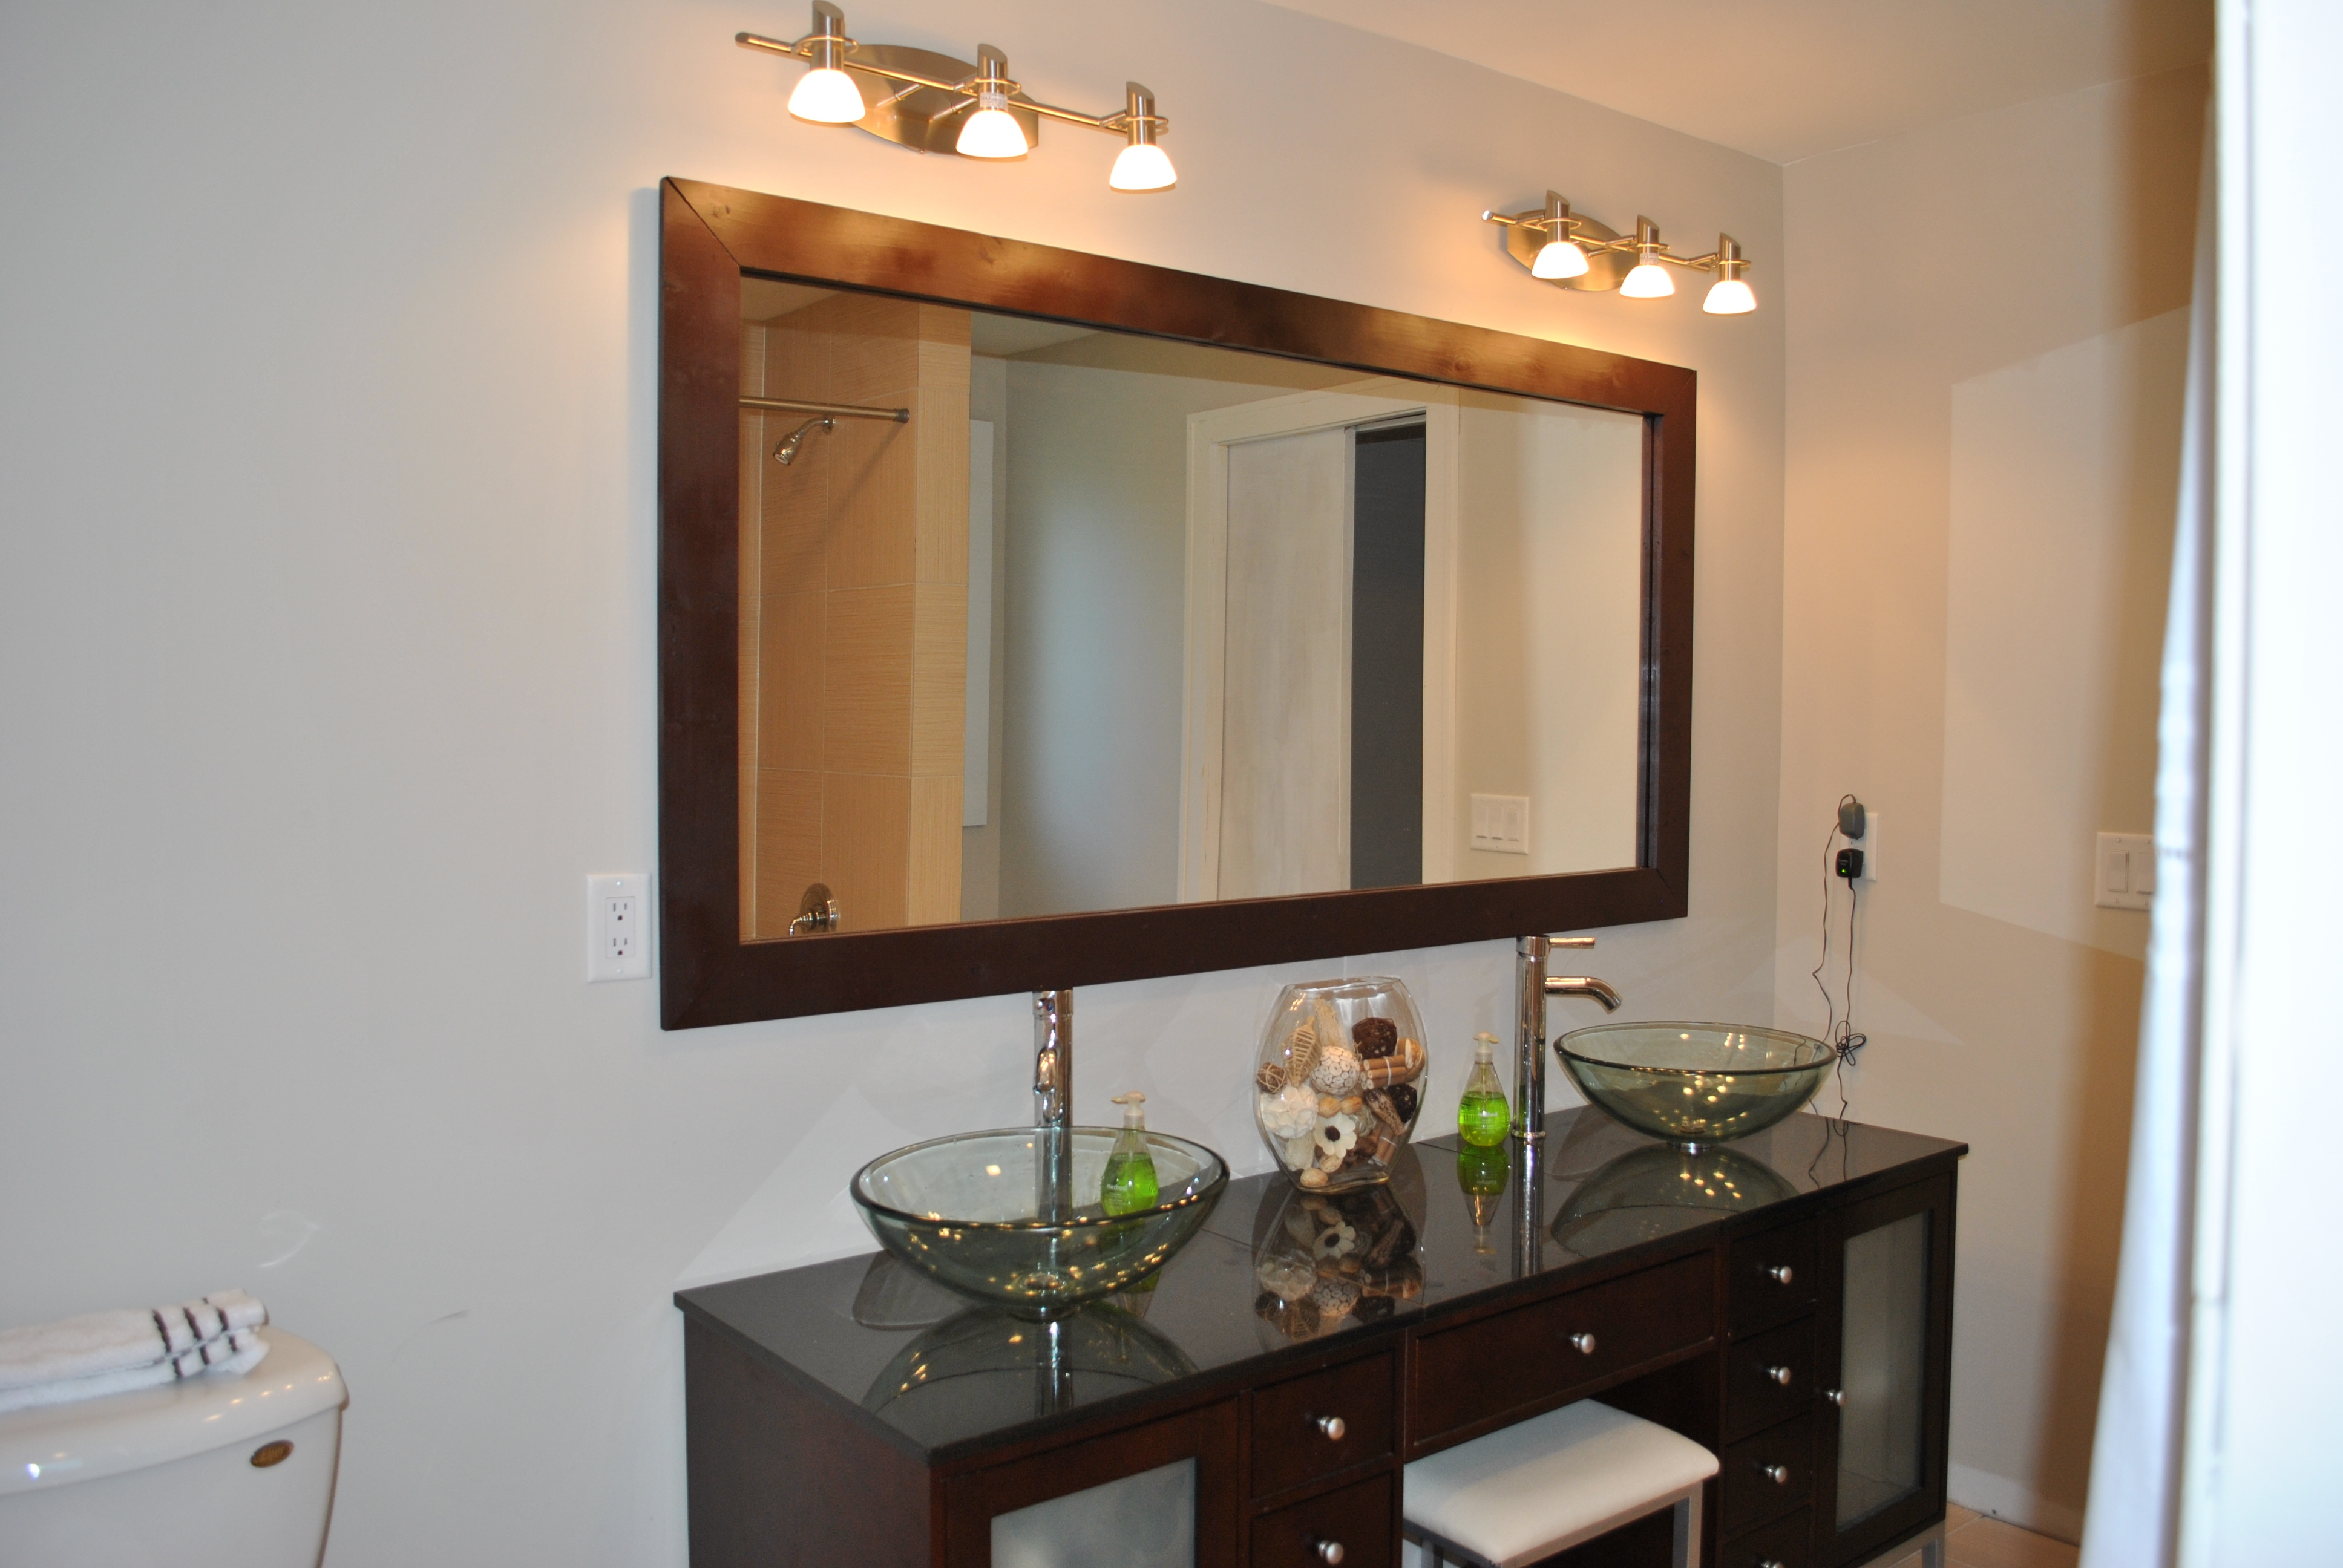 Horizontal Framed Bathroom Mirrors